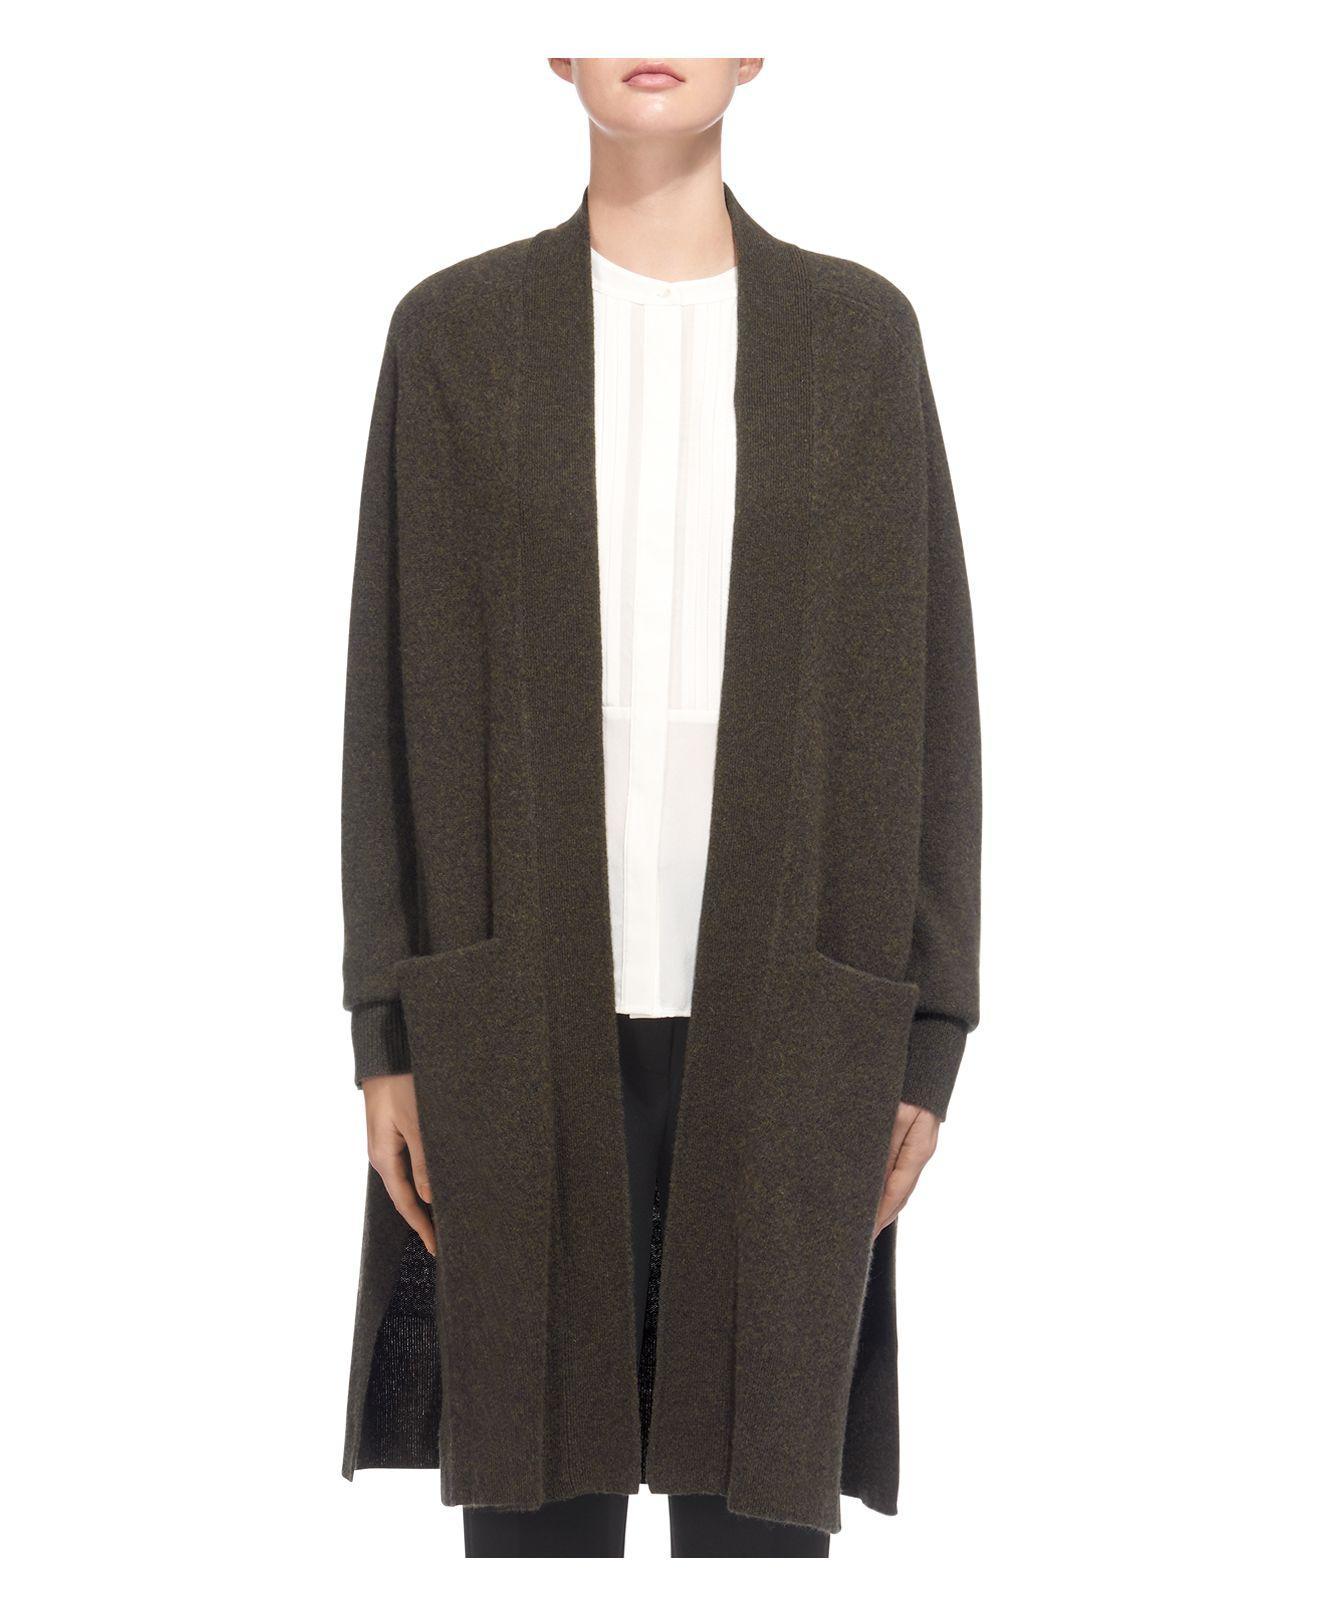 Whistles Boiled Wool Longline Cardigan | Lyst